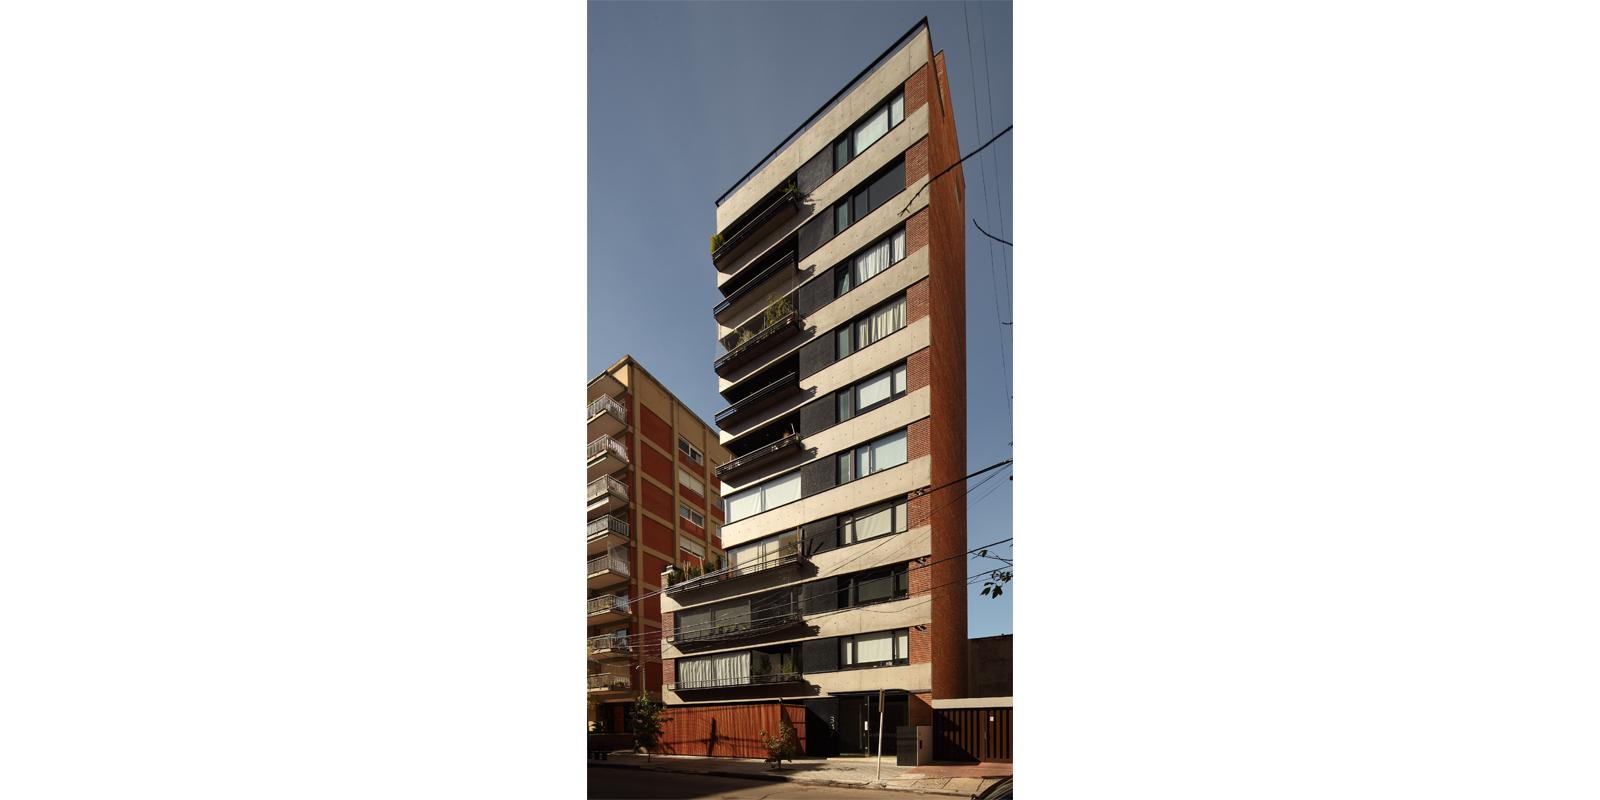 ProyectoC_Arquitectos_Portfolio_01_VicenteLopez